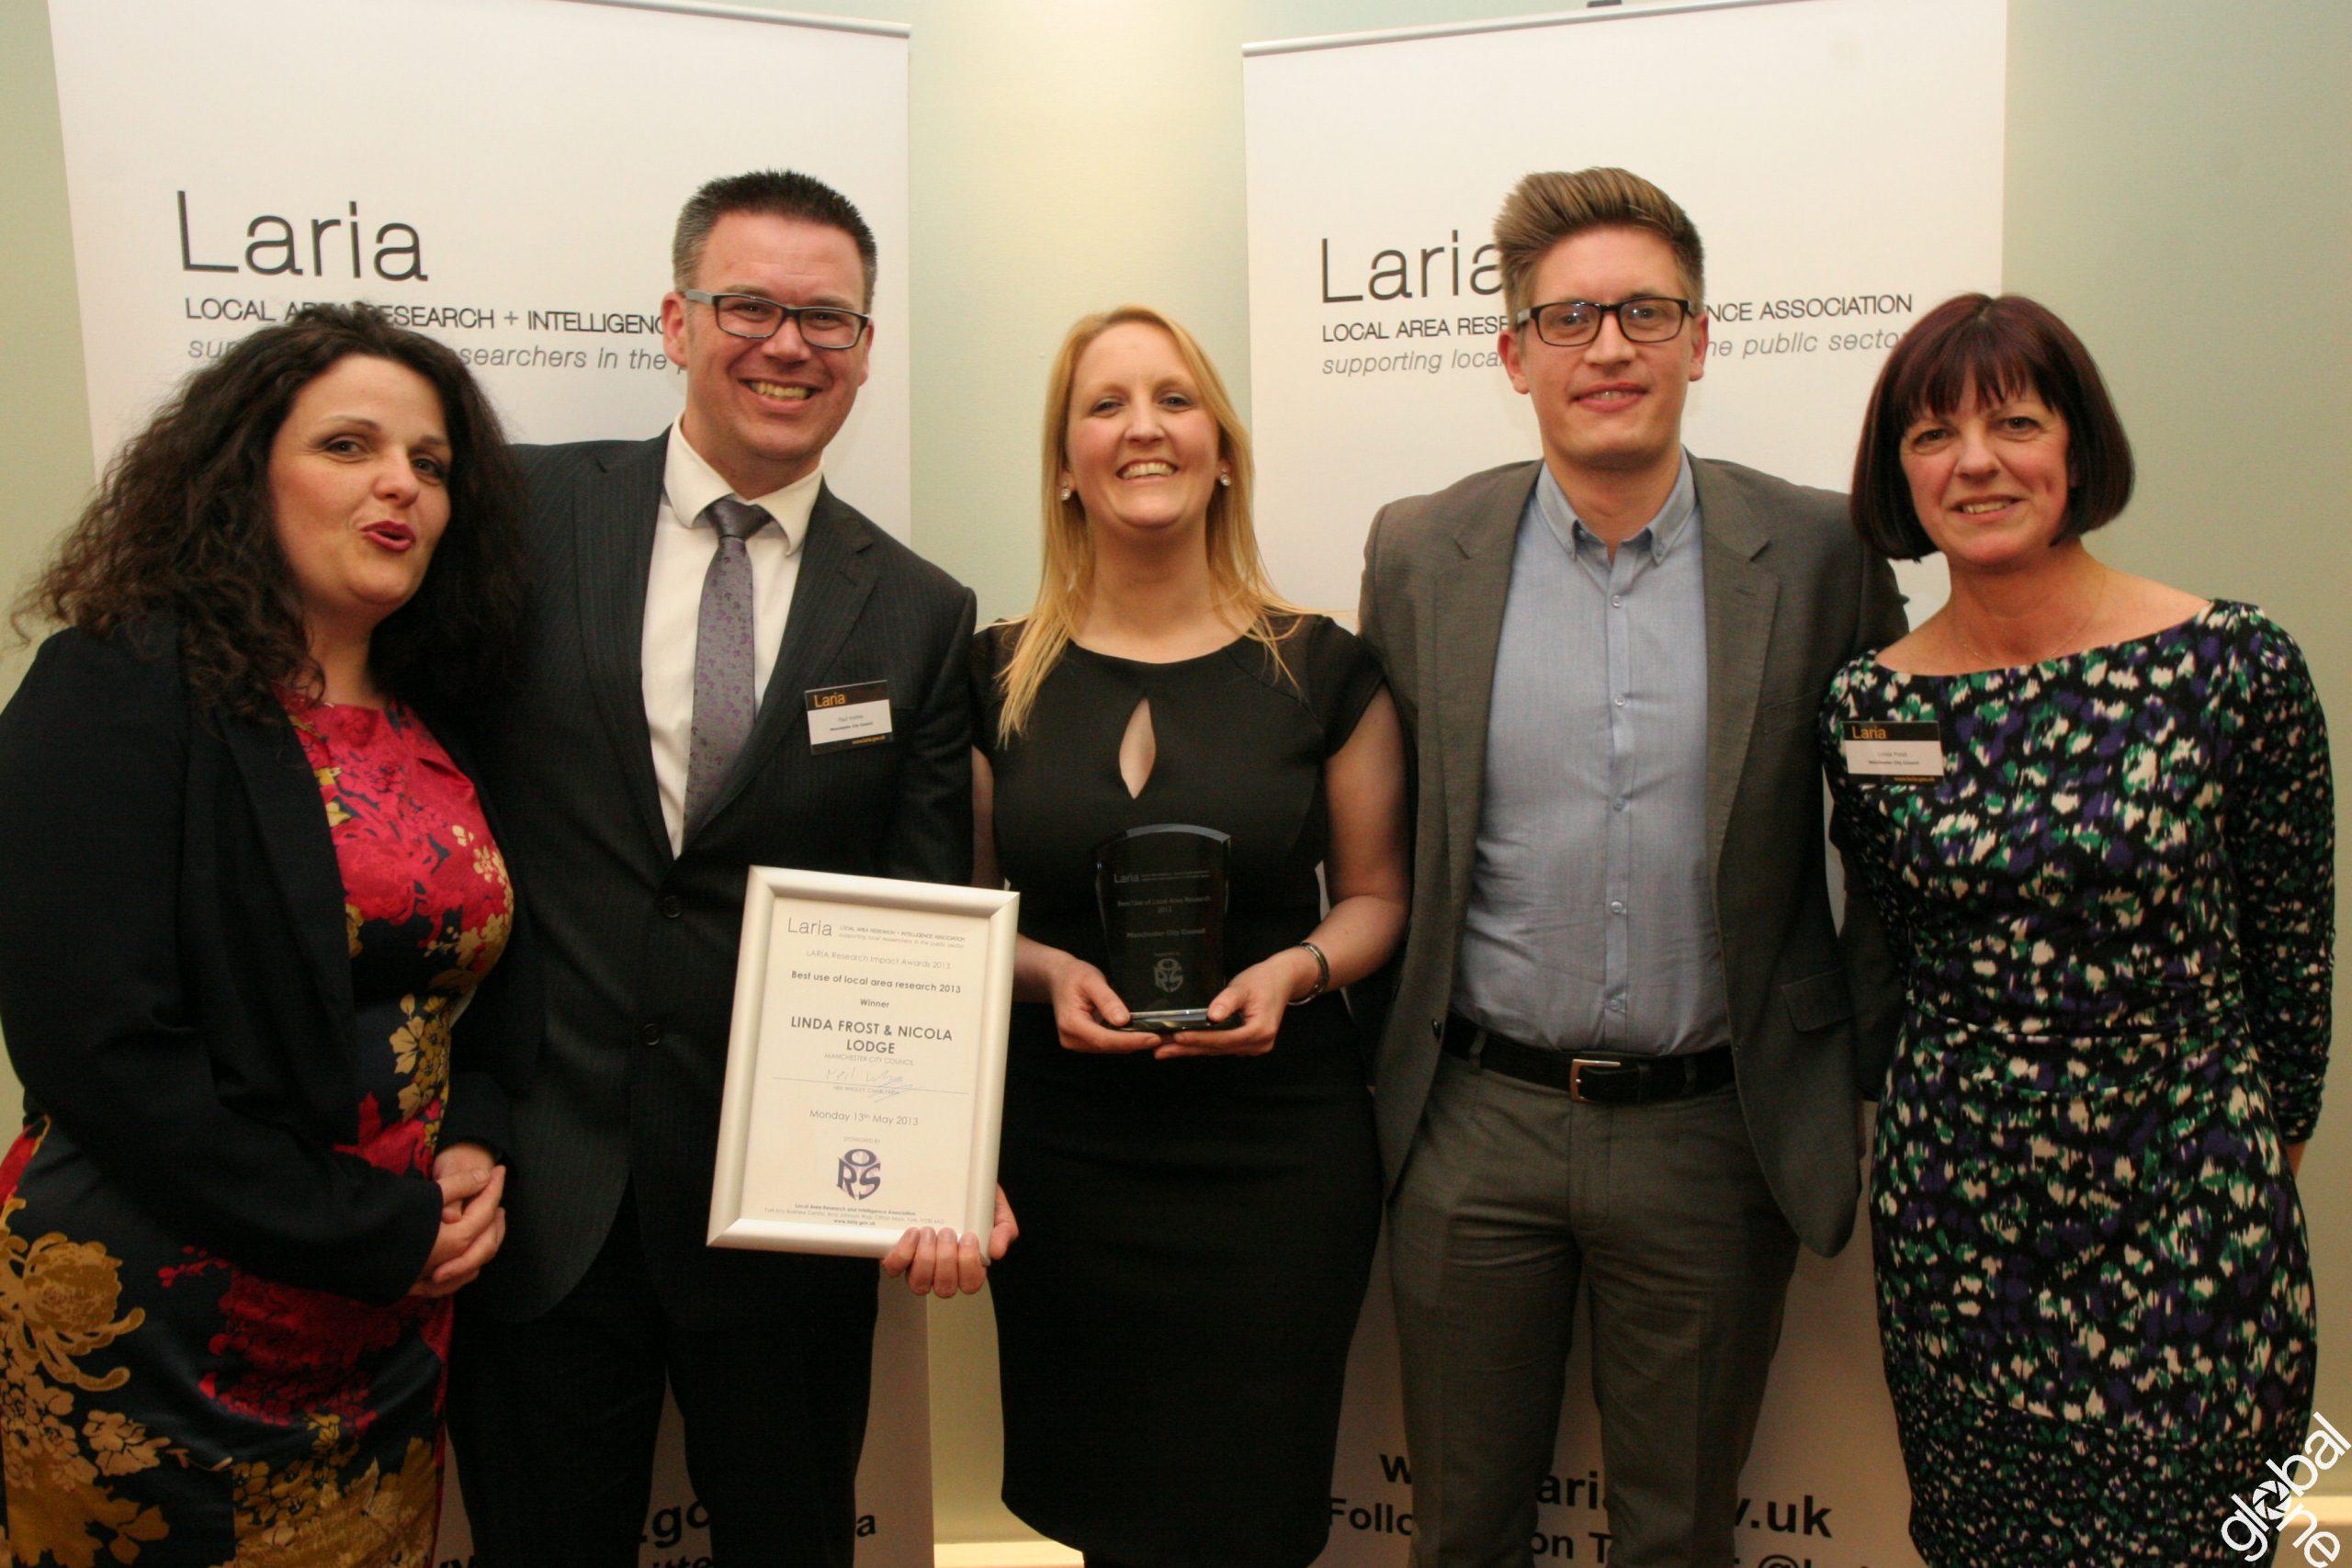 Manchester City Council winning a LARIA award